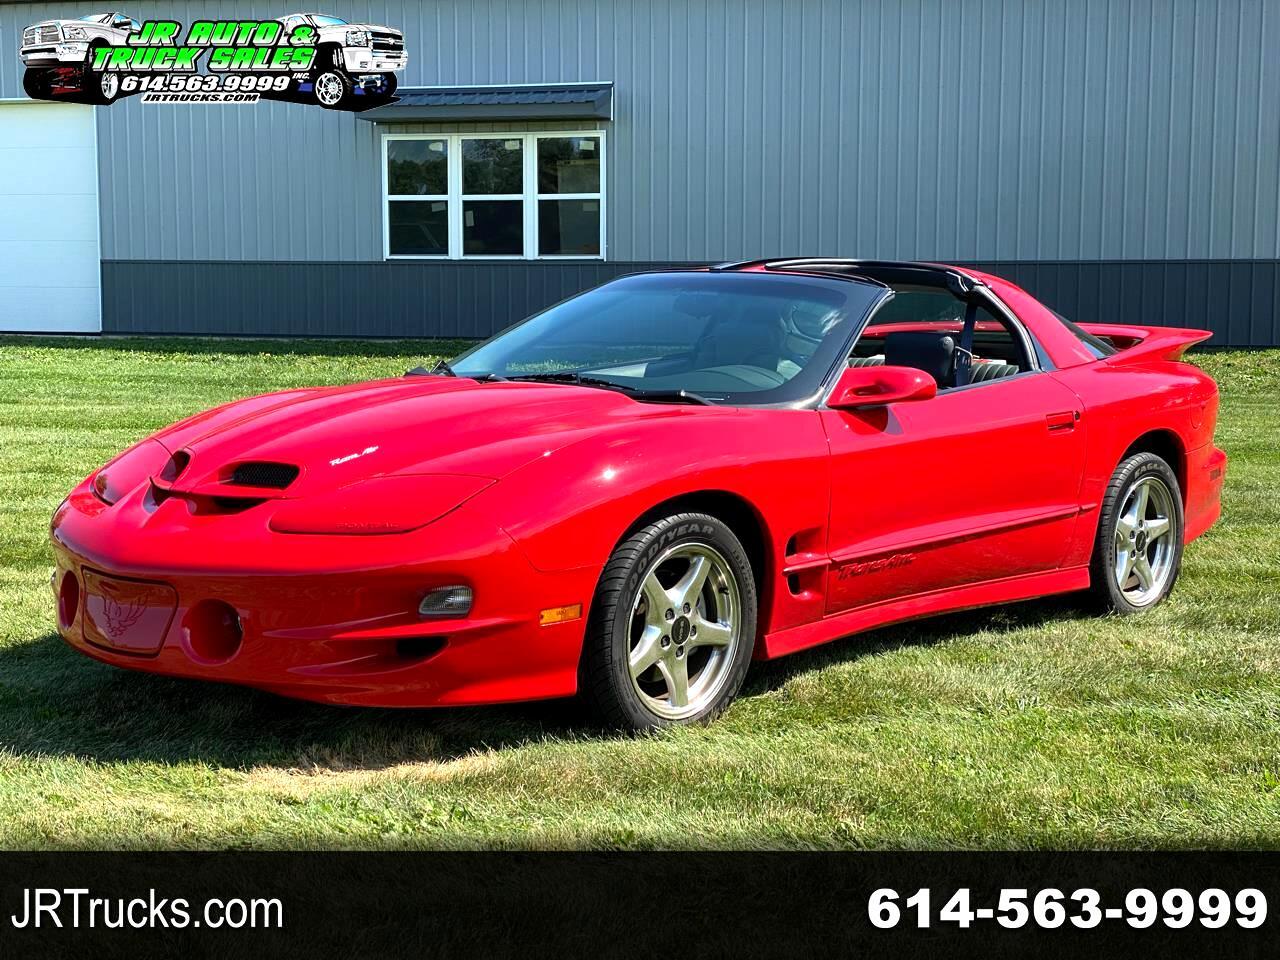 1998 Pontiac Firebird TRANS AM WS6